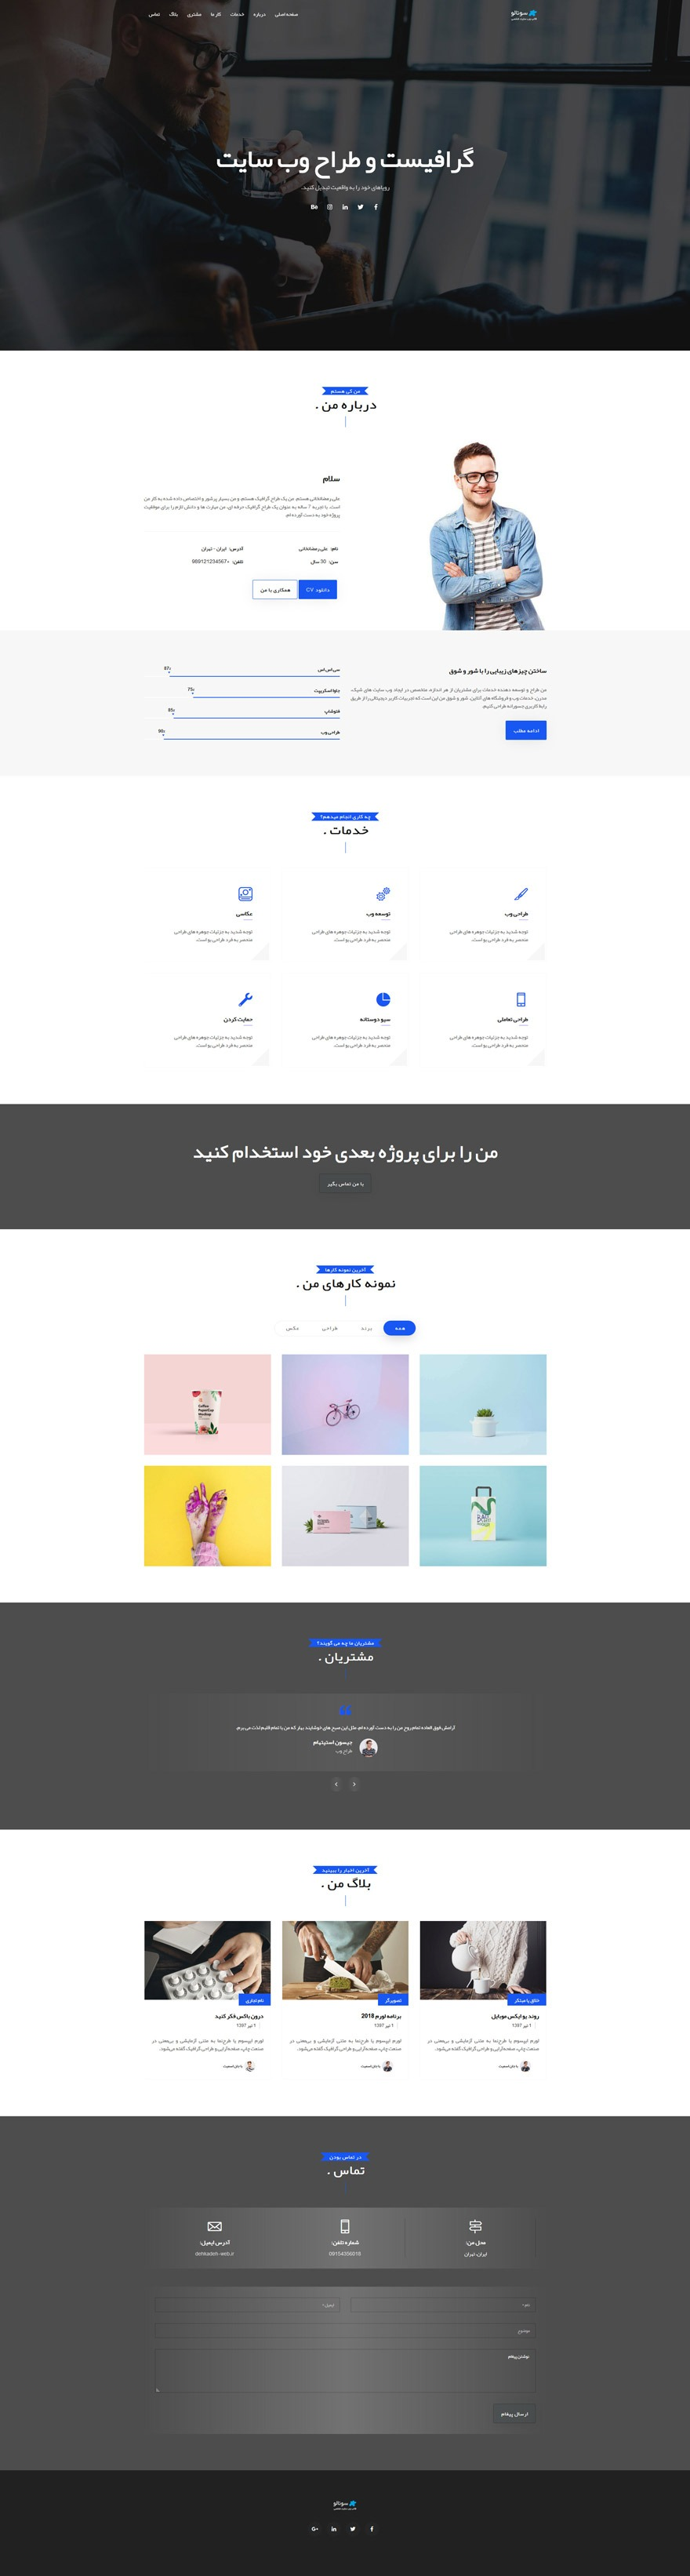 طراحی سایت نمونه کار